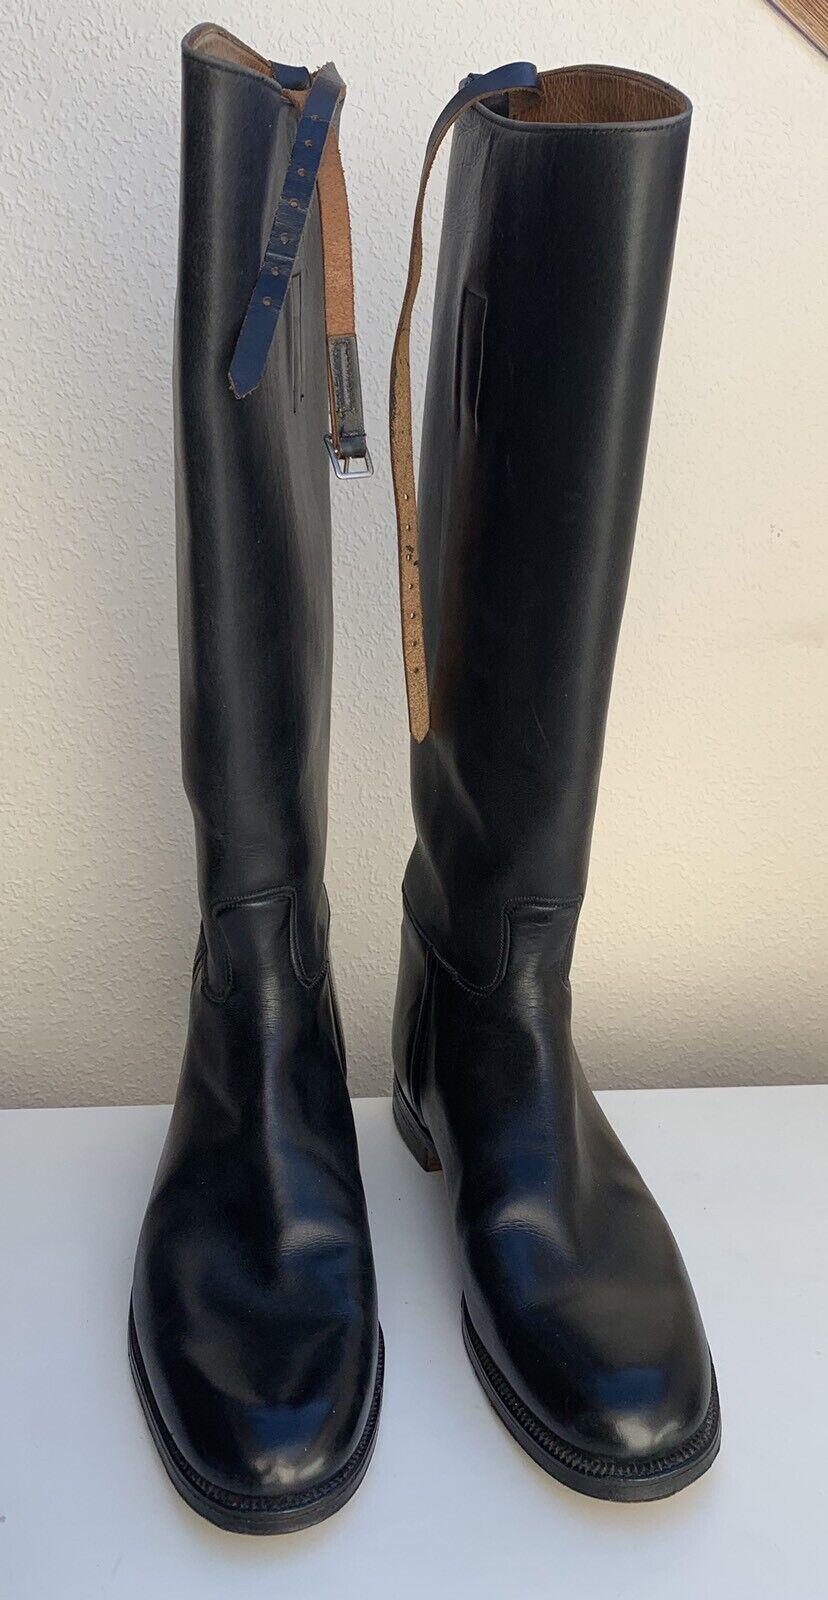 Good Quality Leather Riding Boots Narrow Slim Leg UK Size 8